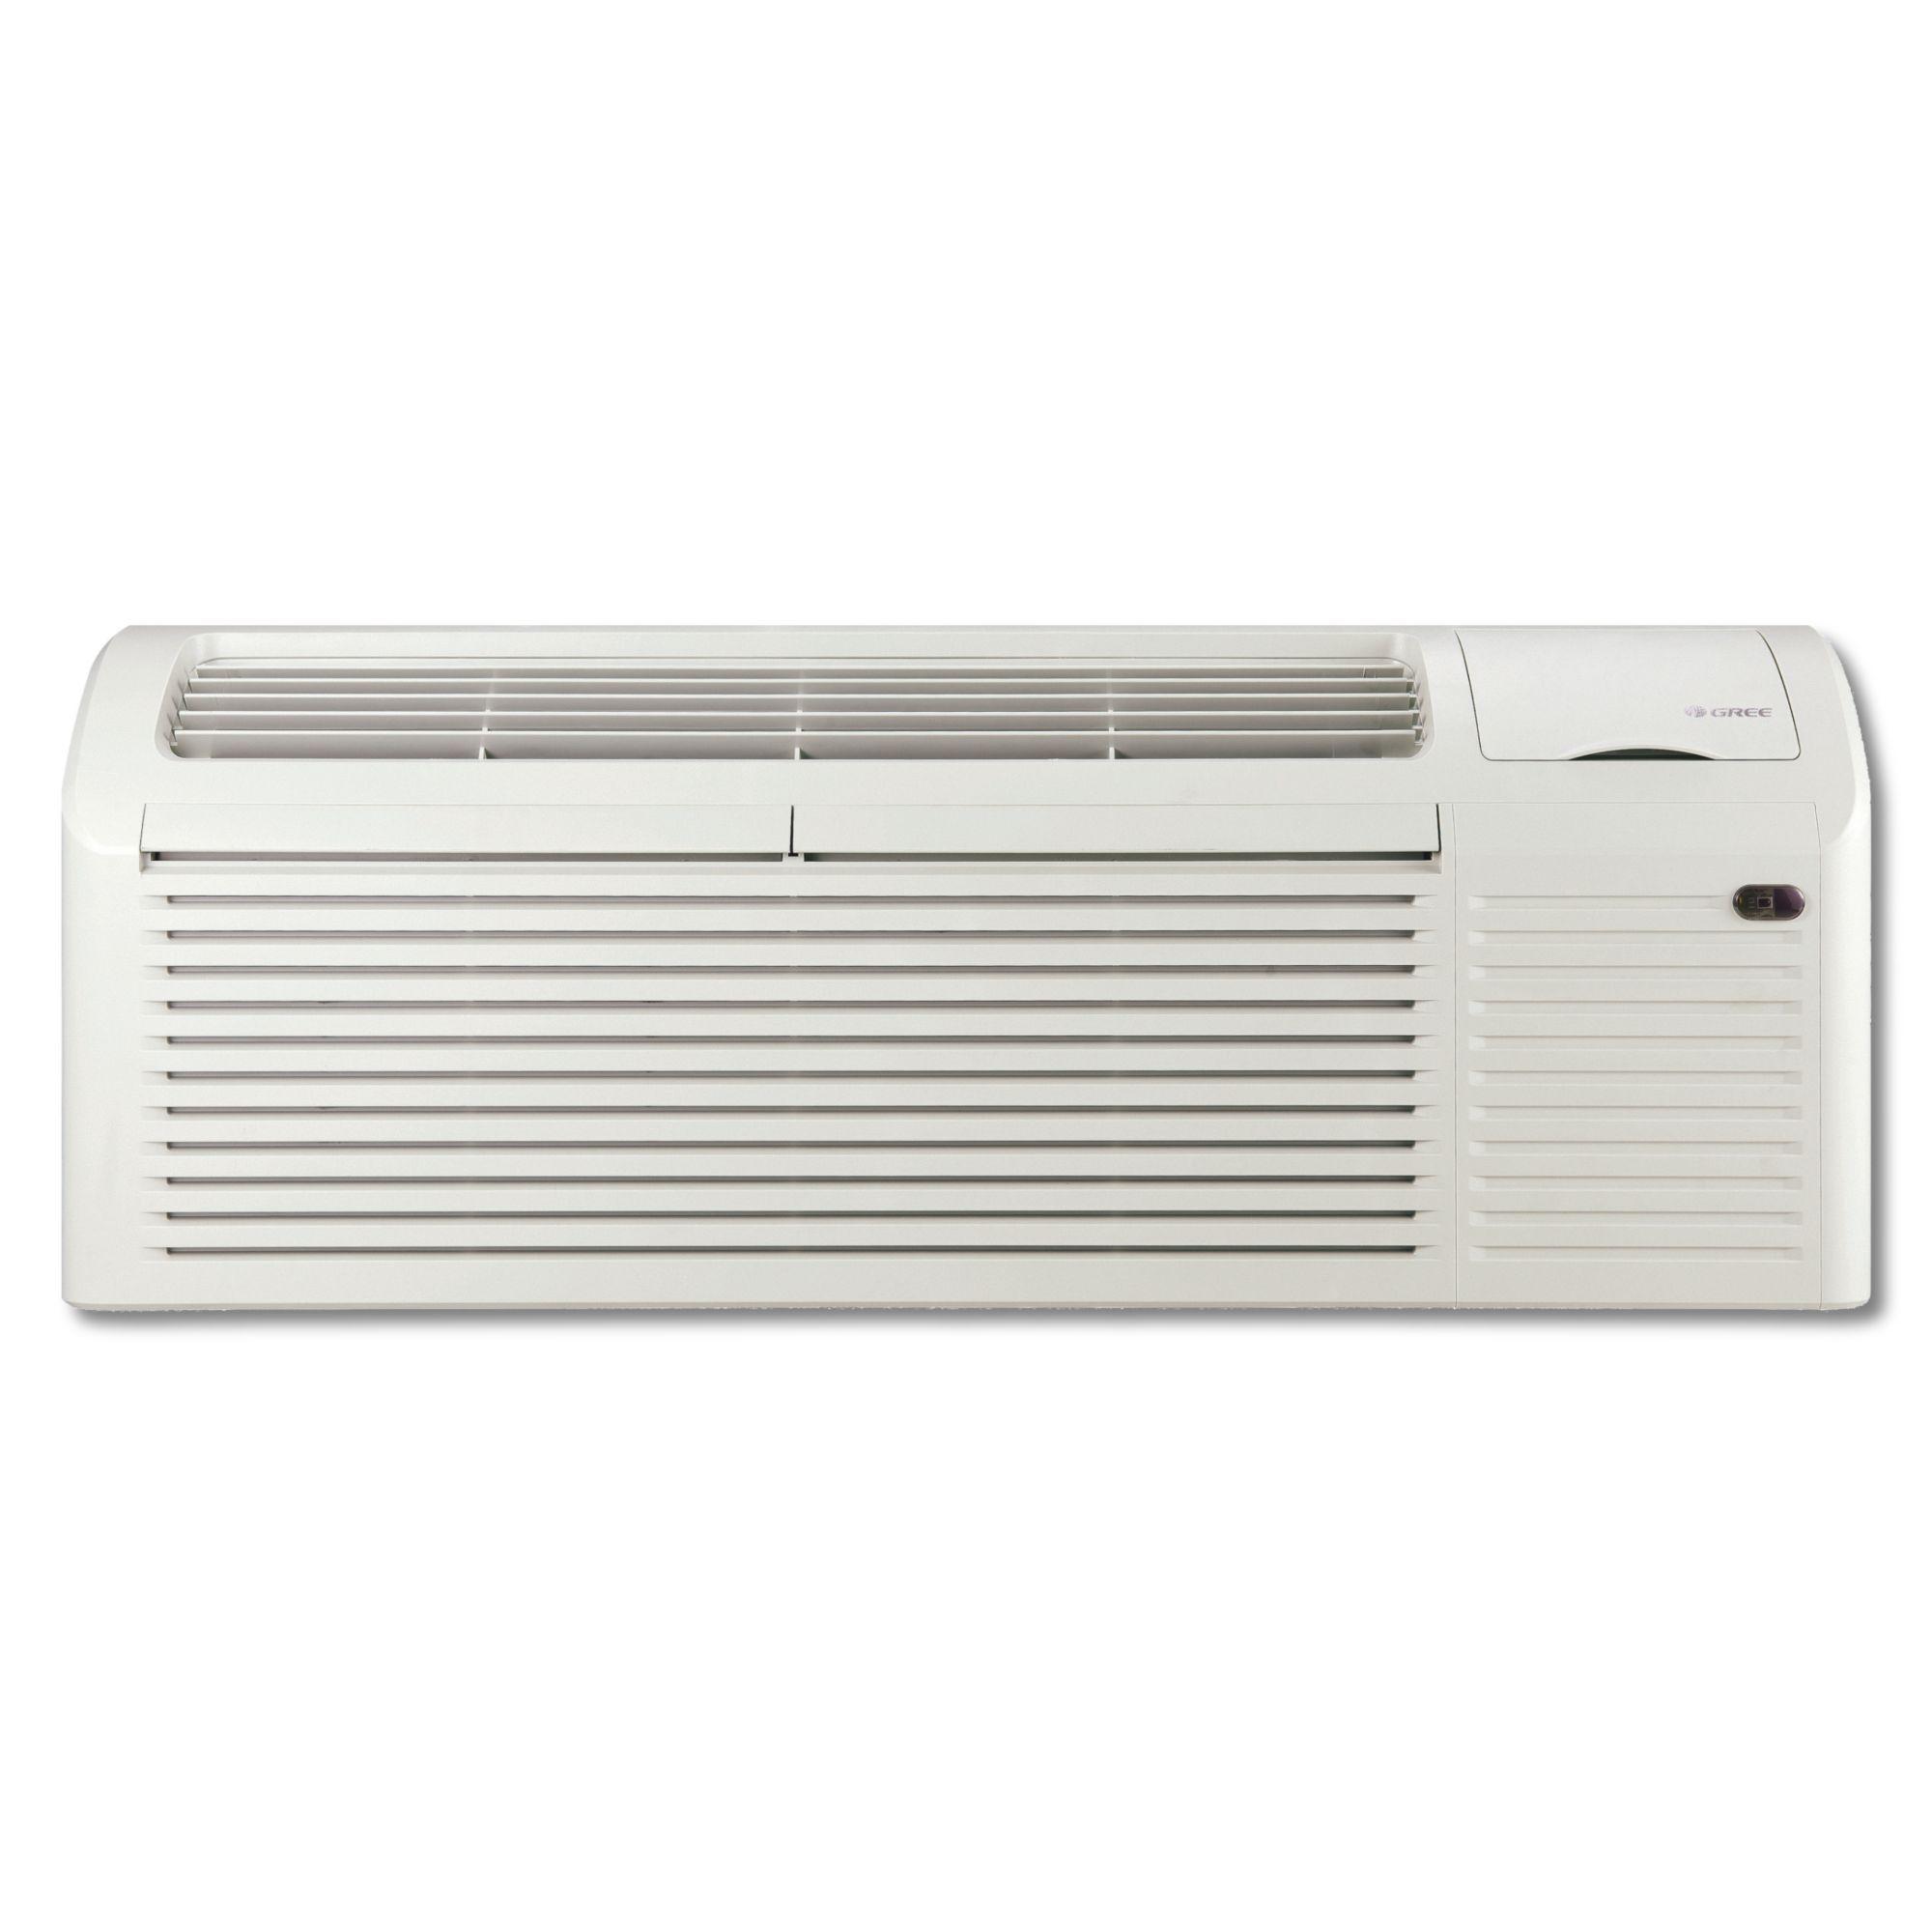 7,000 BTU 12.2 EER Heat/Cool 208230V & 3Kw Heat